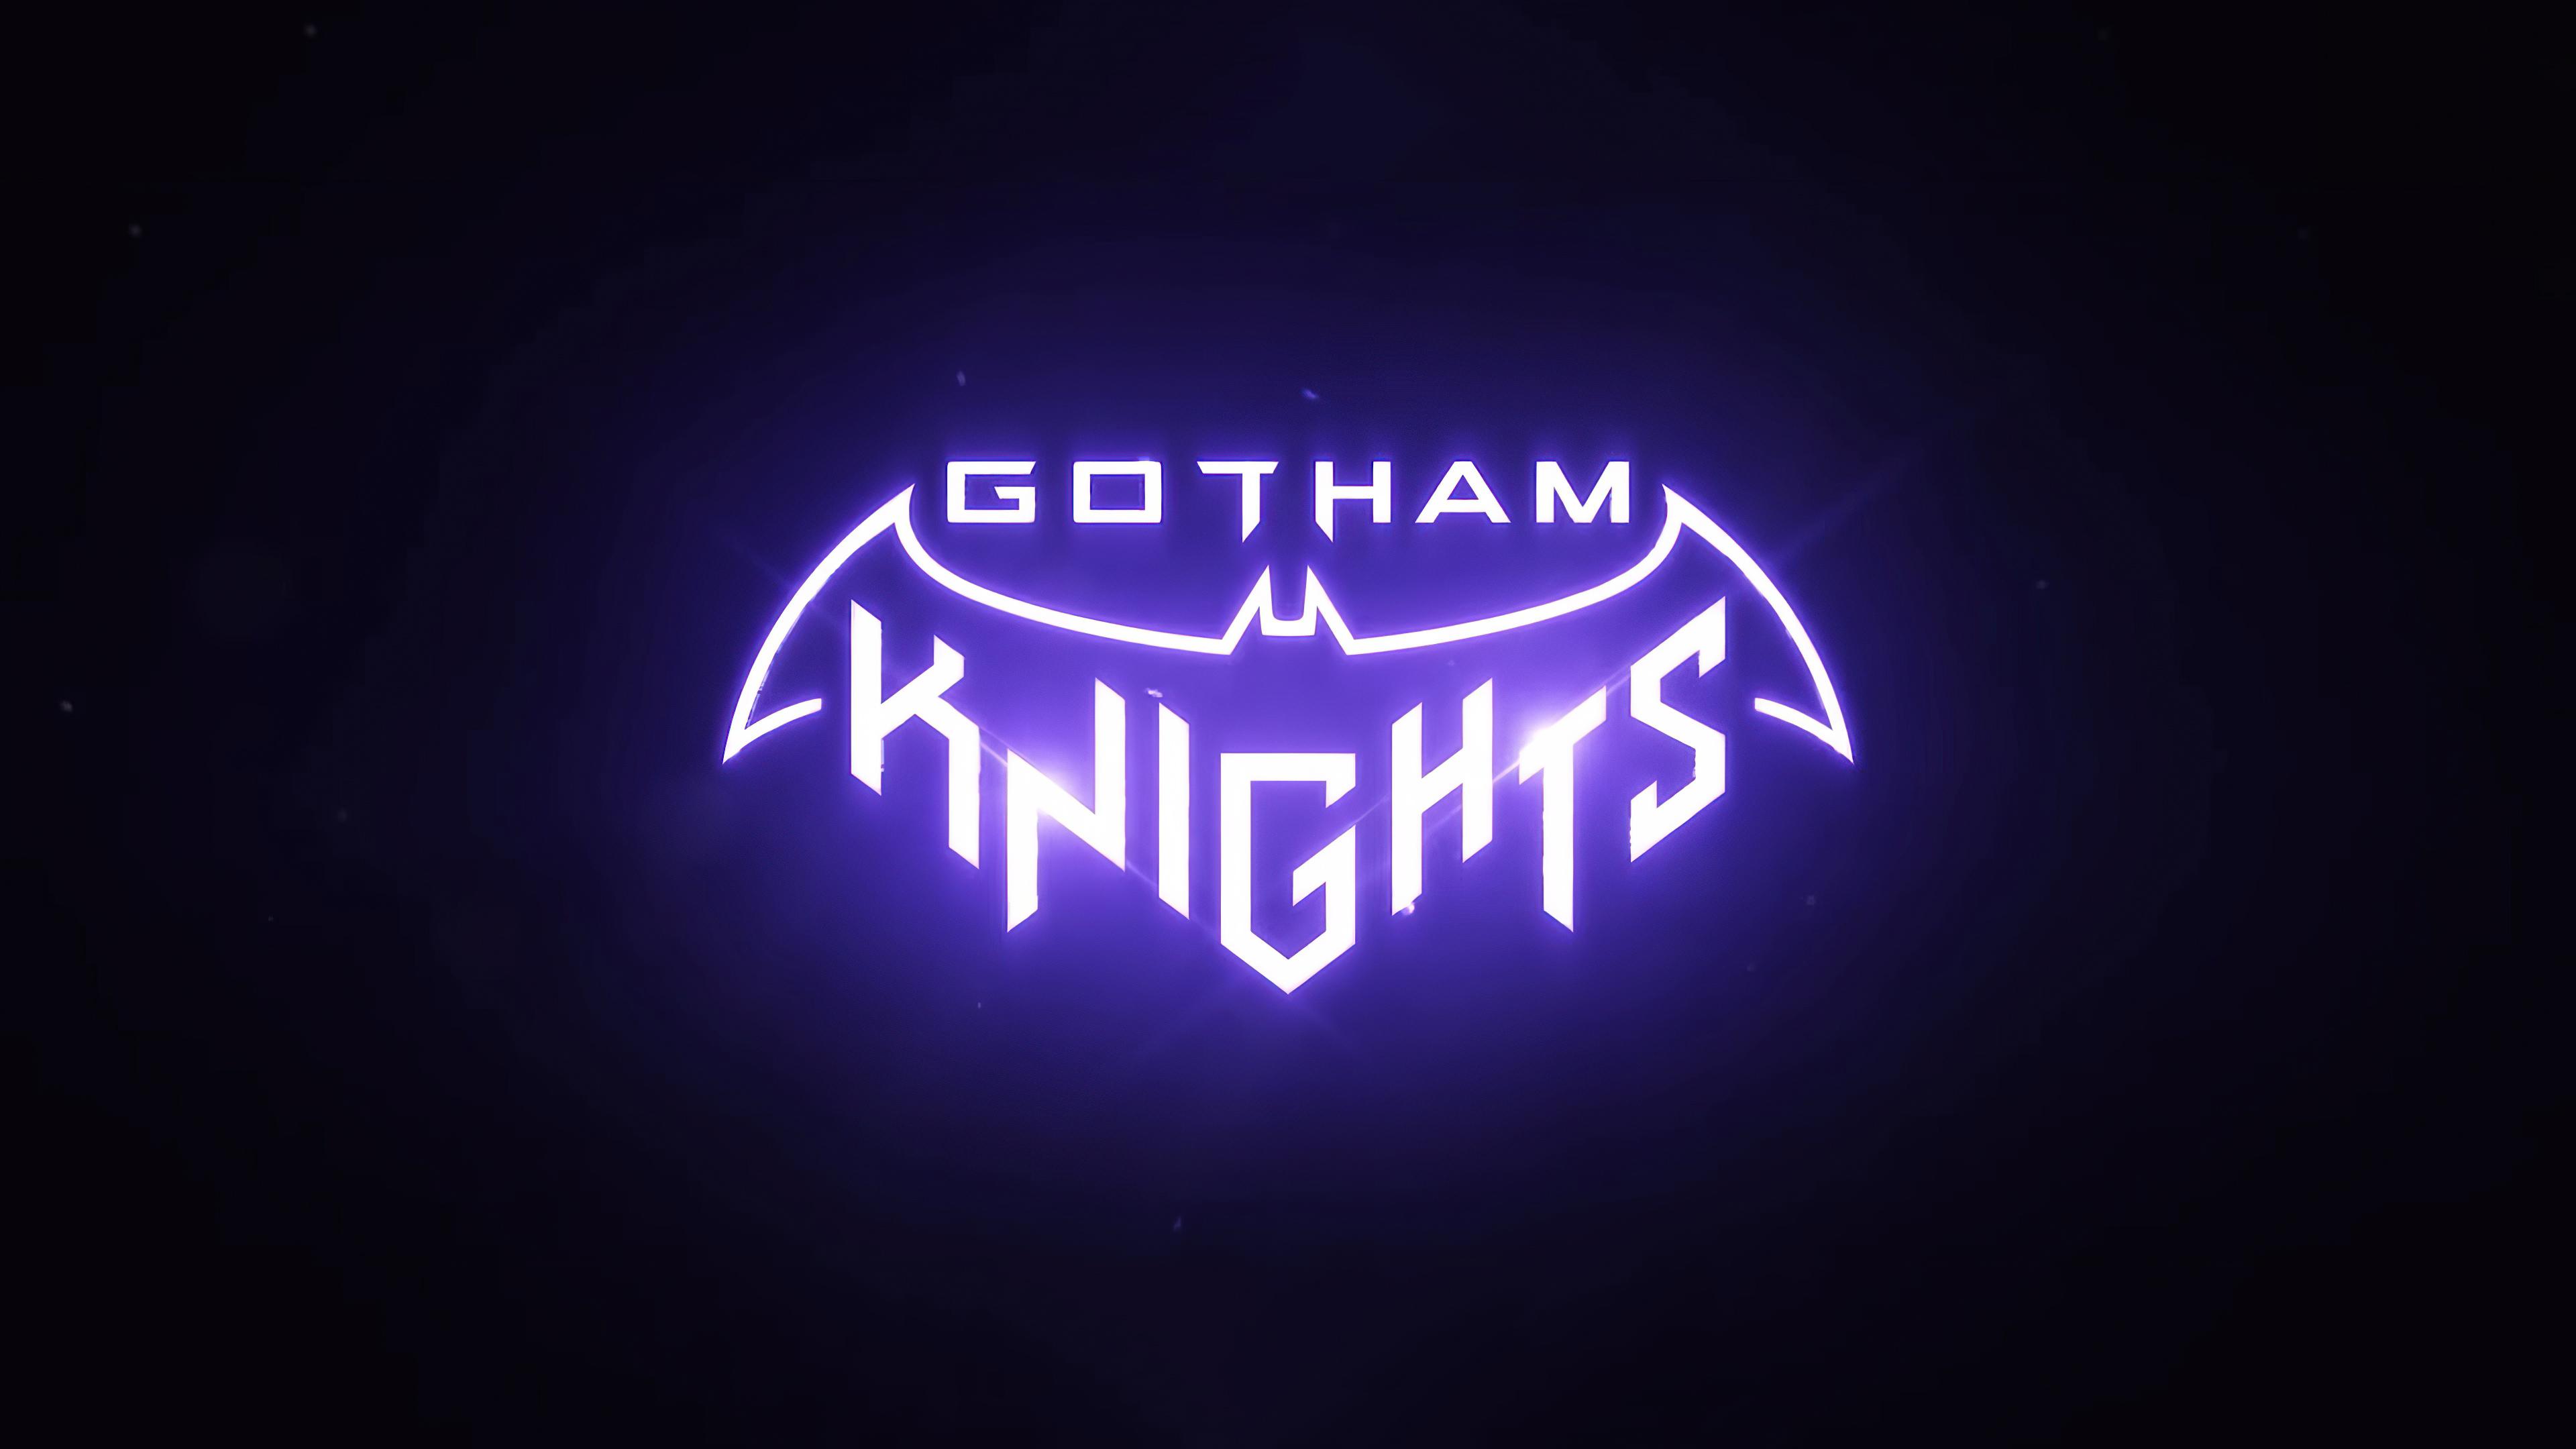 gotham knights logo wallpaper 73237